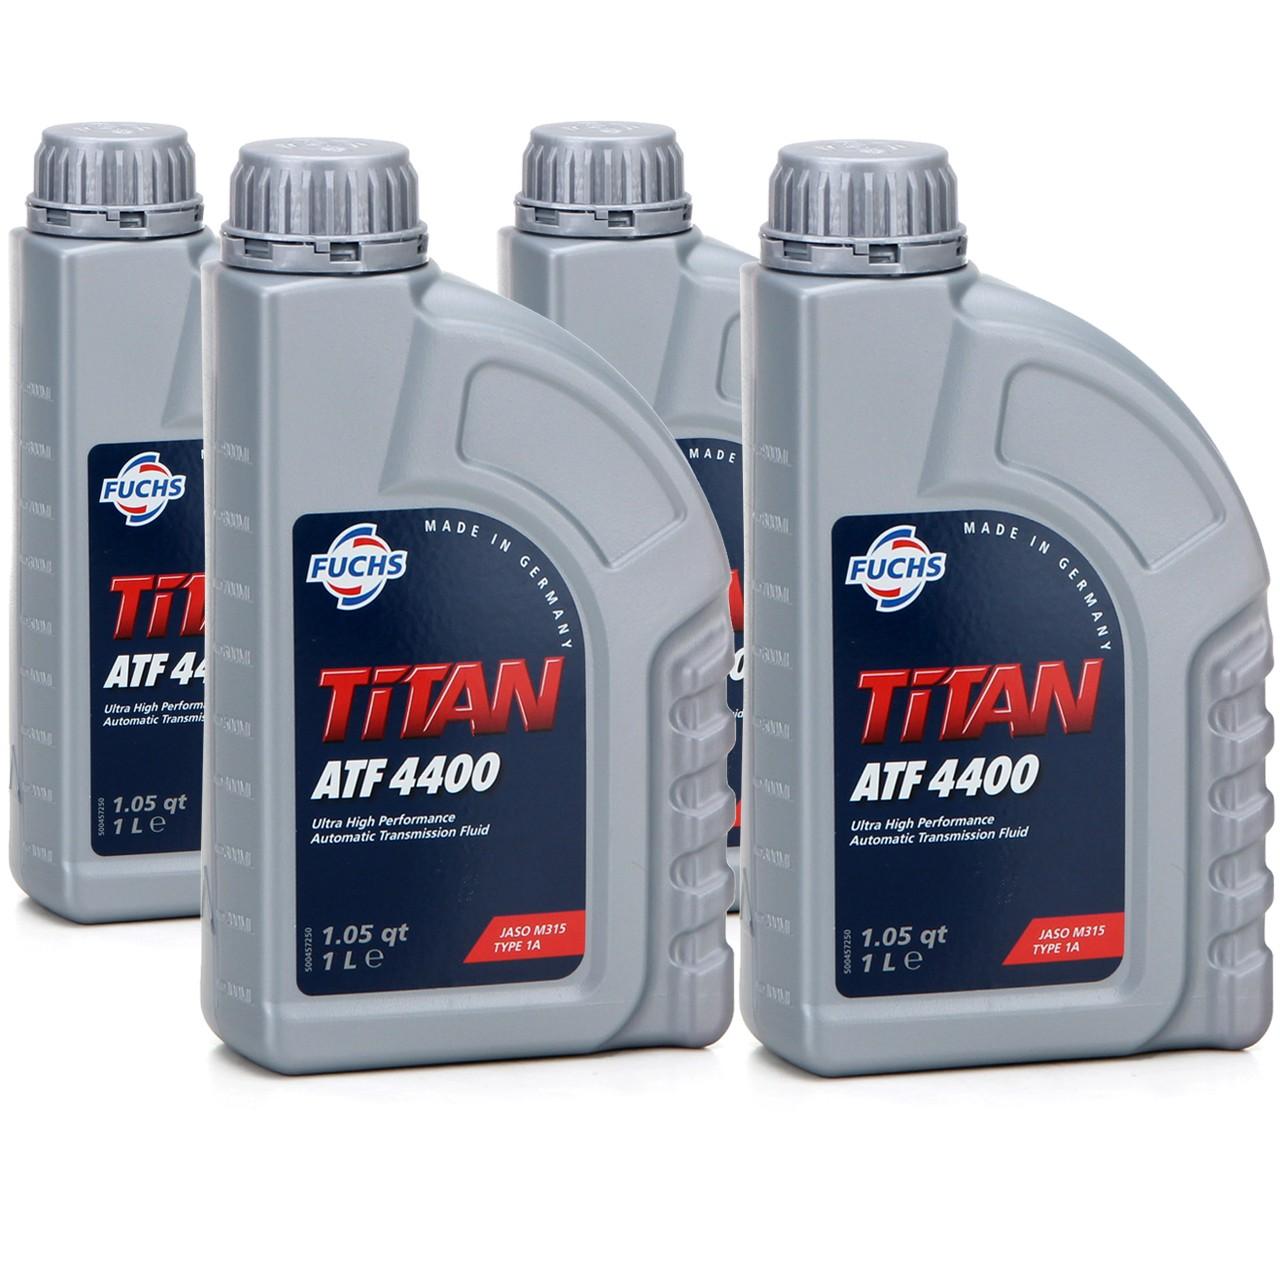 FUCHS Getriebeöl Automatiköl Automatikgetriebeöl TITAN ATF 4400 4 Liter 4L